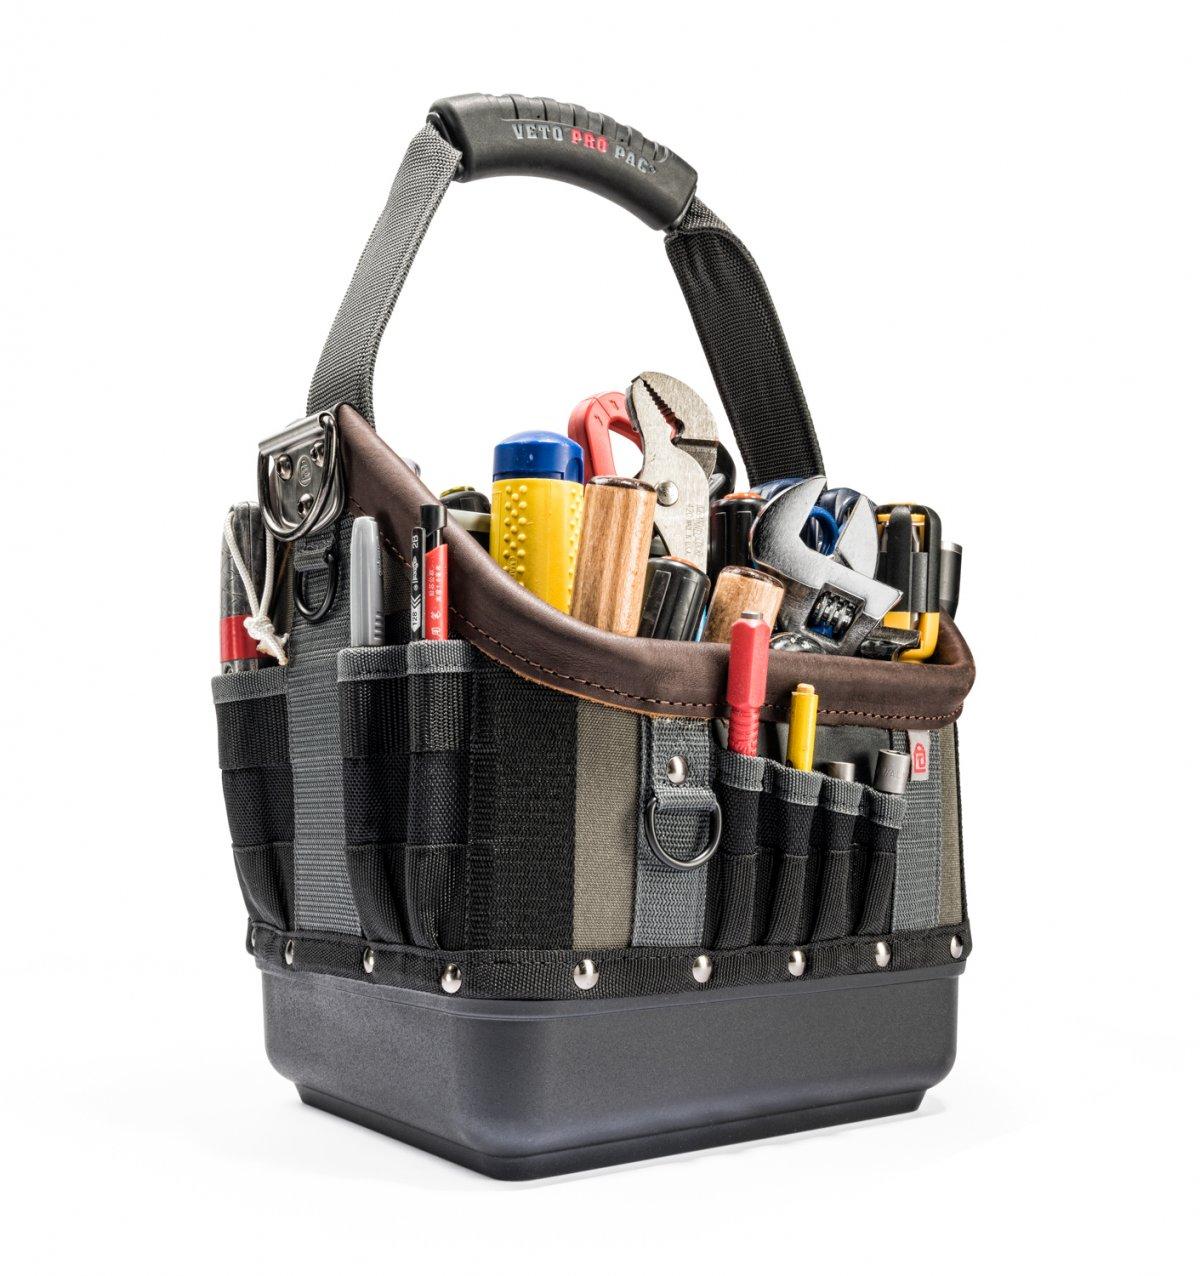 Veto Pro Pac Tech OT-MC Tool Bag by LIVEDITOR LIGHTING